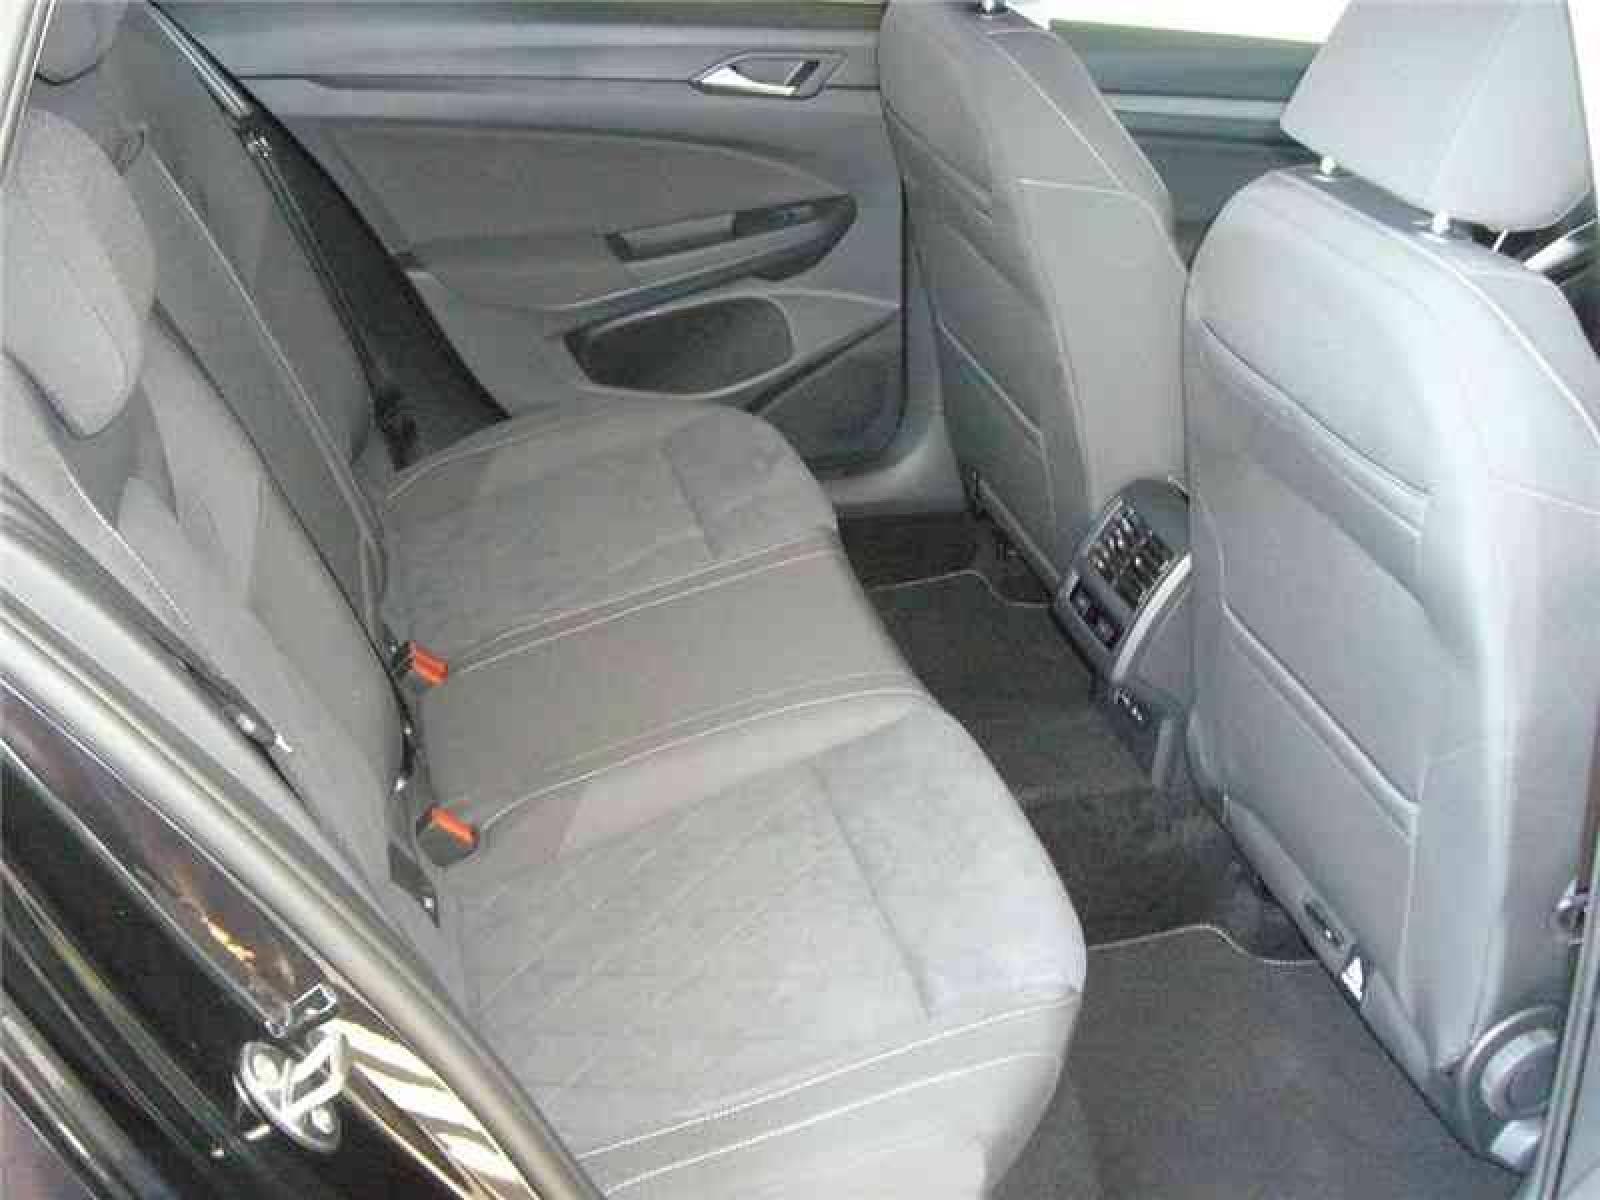 VOLKSWAGEN Golf SW 2.0 TDI SCR 115 DSG7 - véhicule neuf - LEMAUVIEL AUTOMOBILES - Présentation site web V2 - Lemauviel automobiles - AVRANCHES - 50300 - LE VAL-SAINT-PÈRE - 6